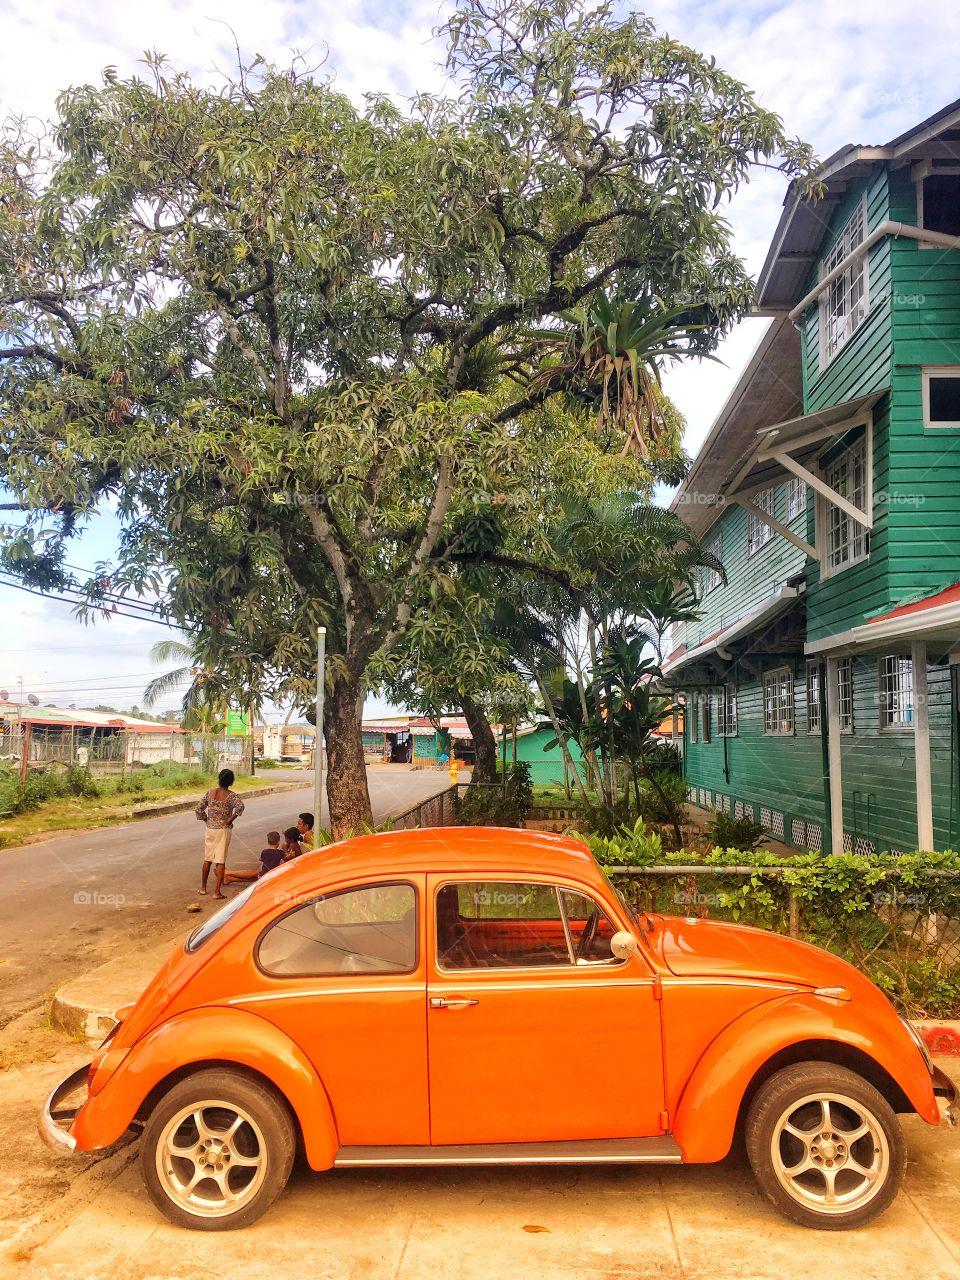 VW in Panama